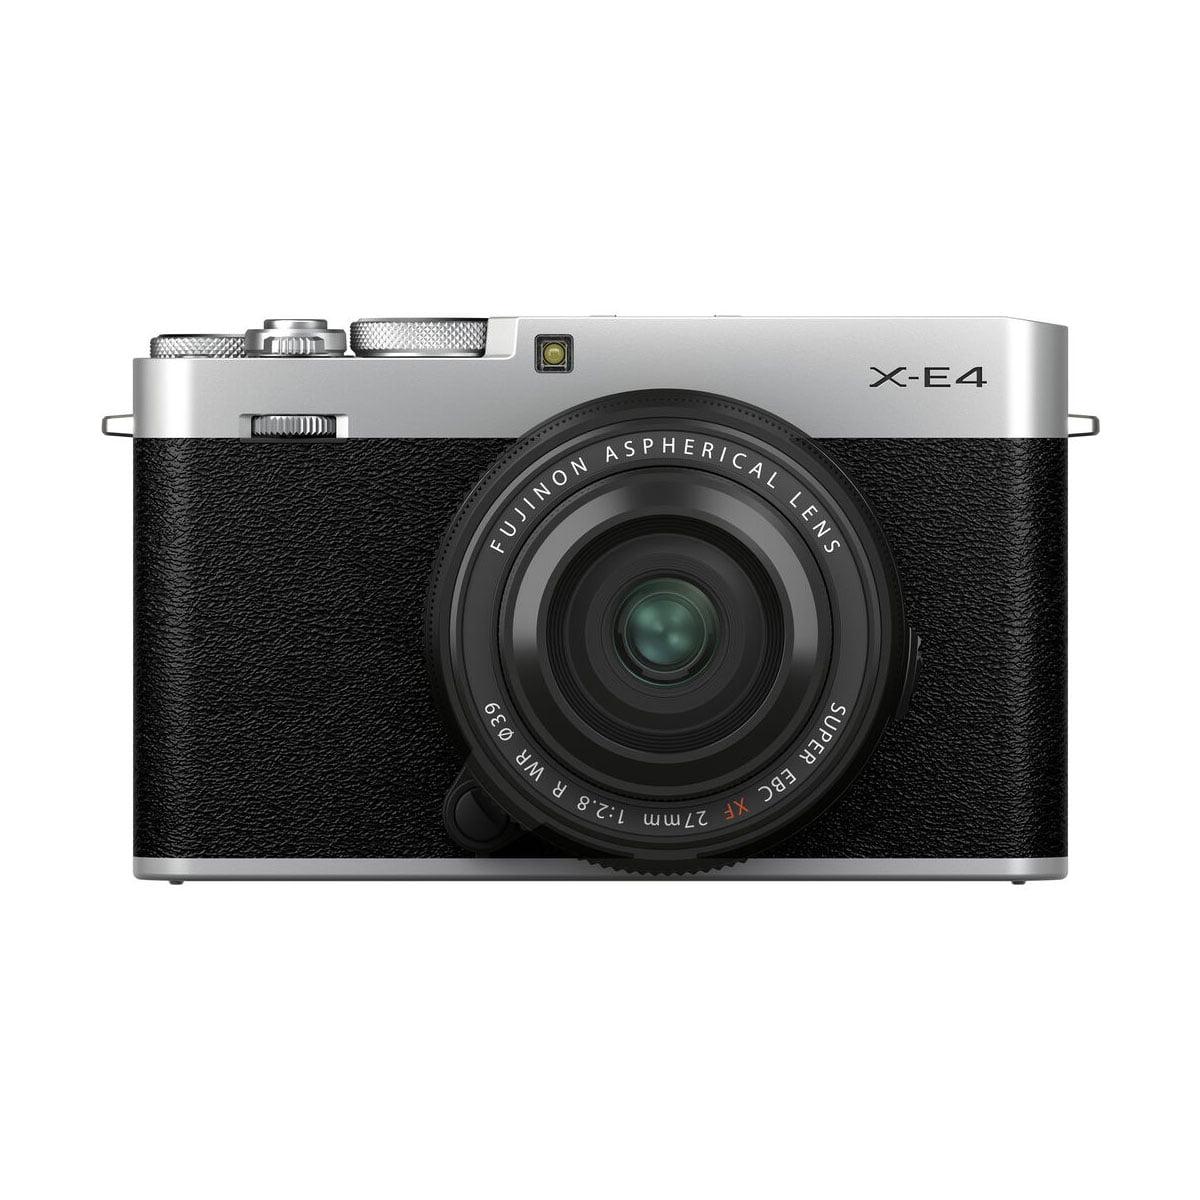 Fujifilm X-E4 + Fujinon 27mm f/2.8 WR – Hopea